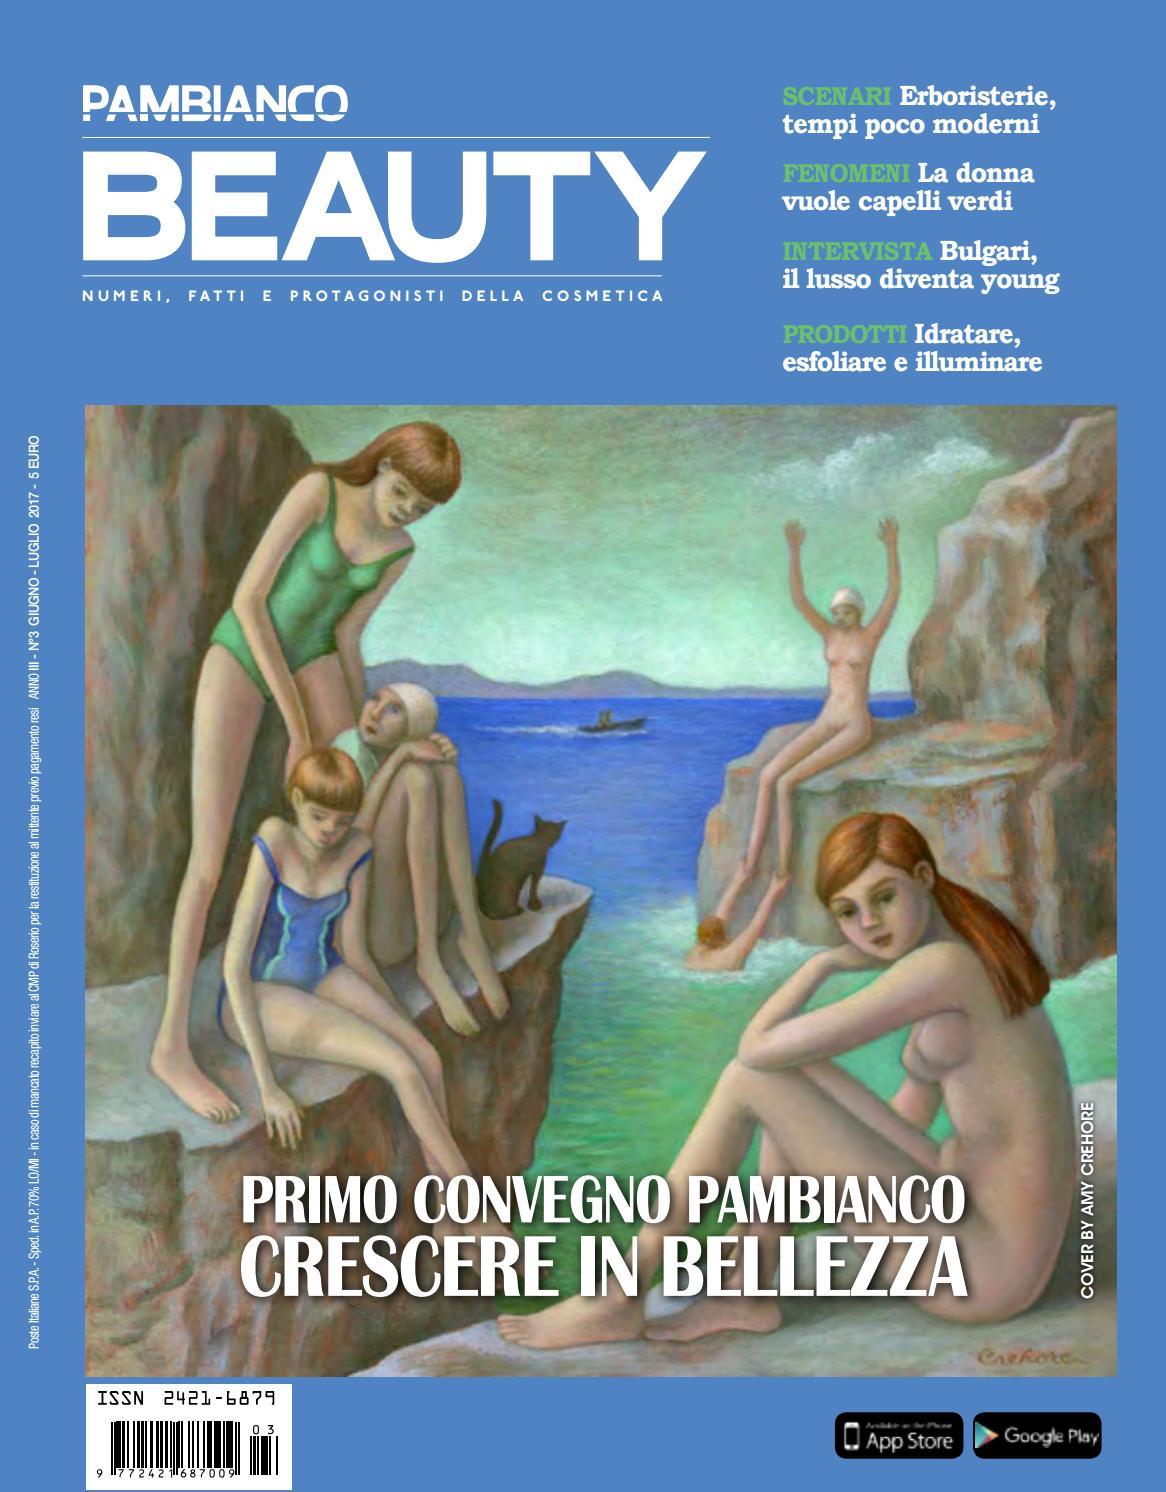 5662b0fb4fc8 Pambianco Beauty N3 2017 by Pambianconews - issuu